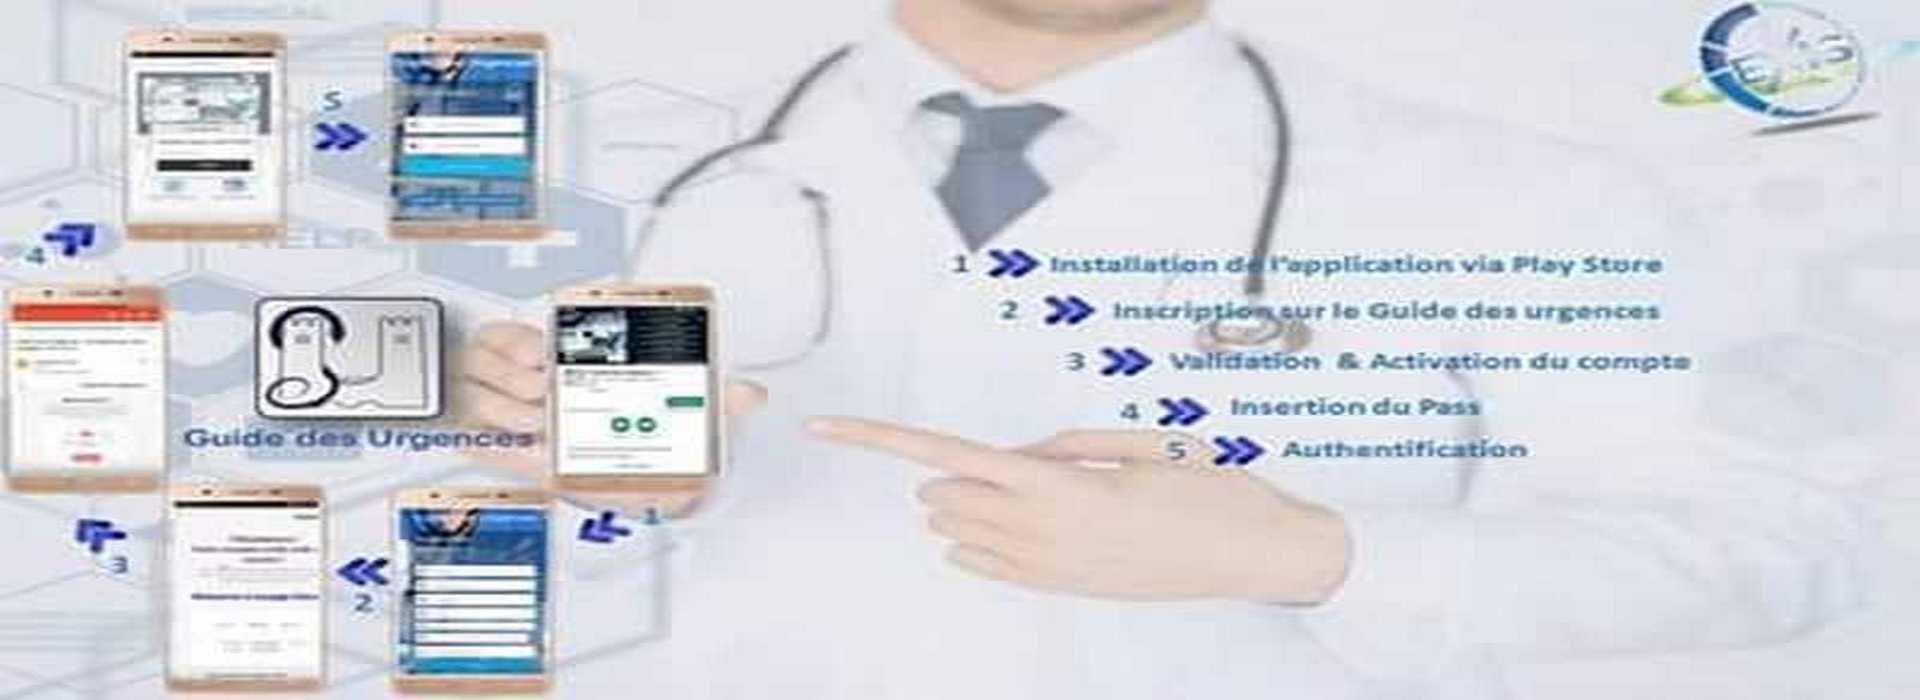 Notre guide des urgences en application smartphone